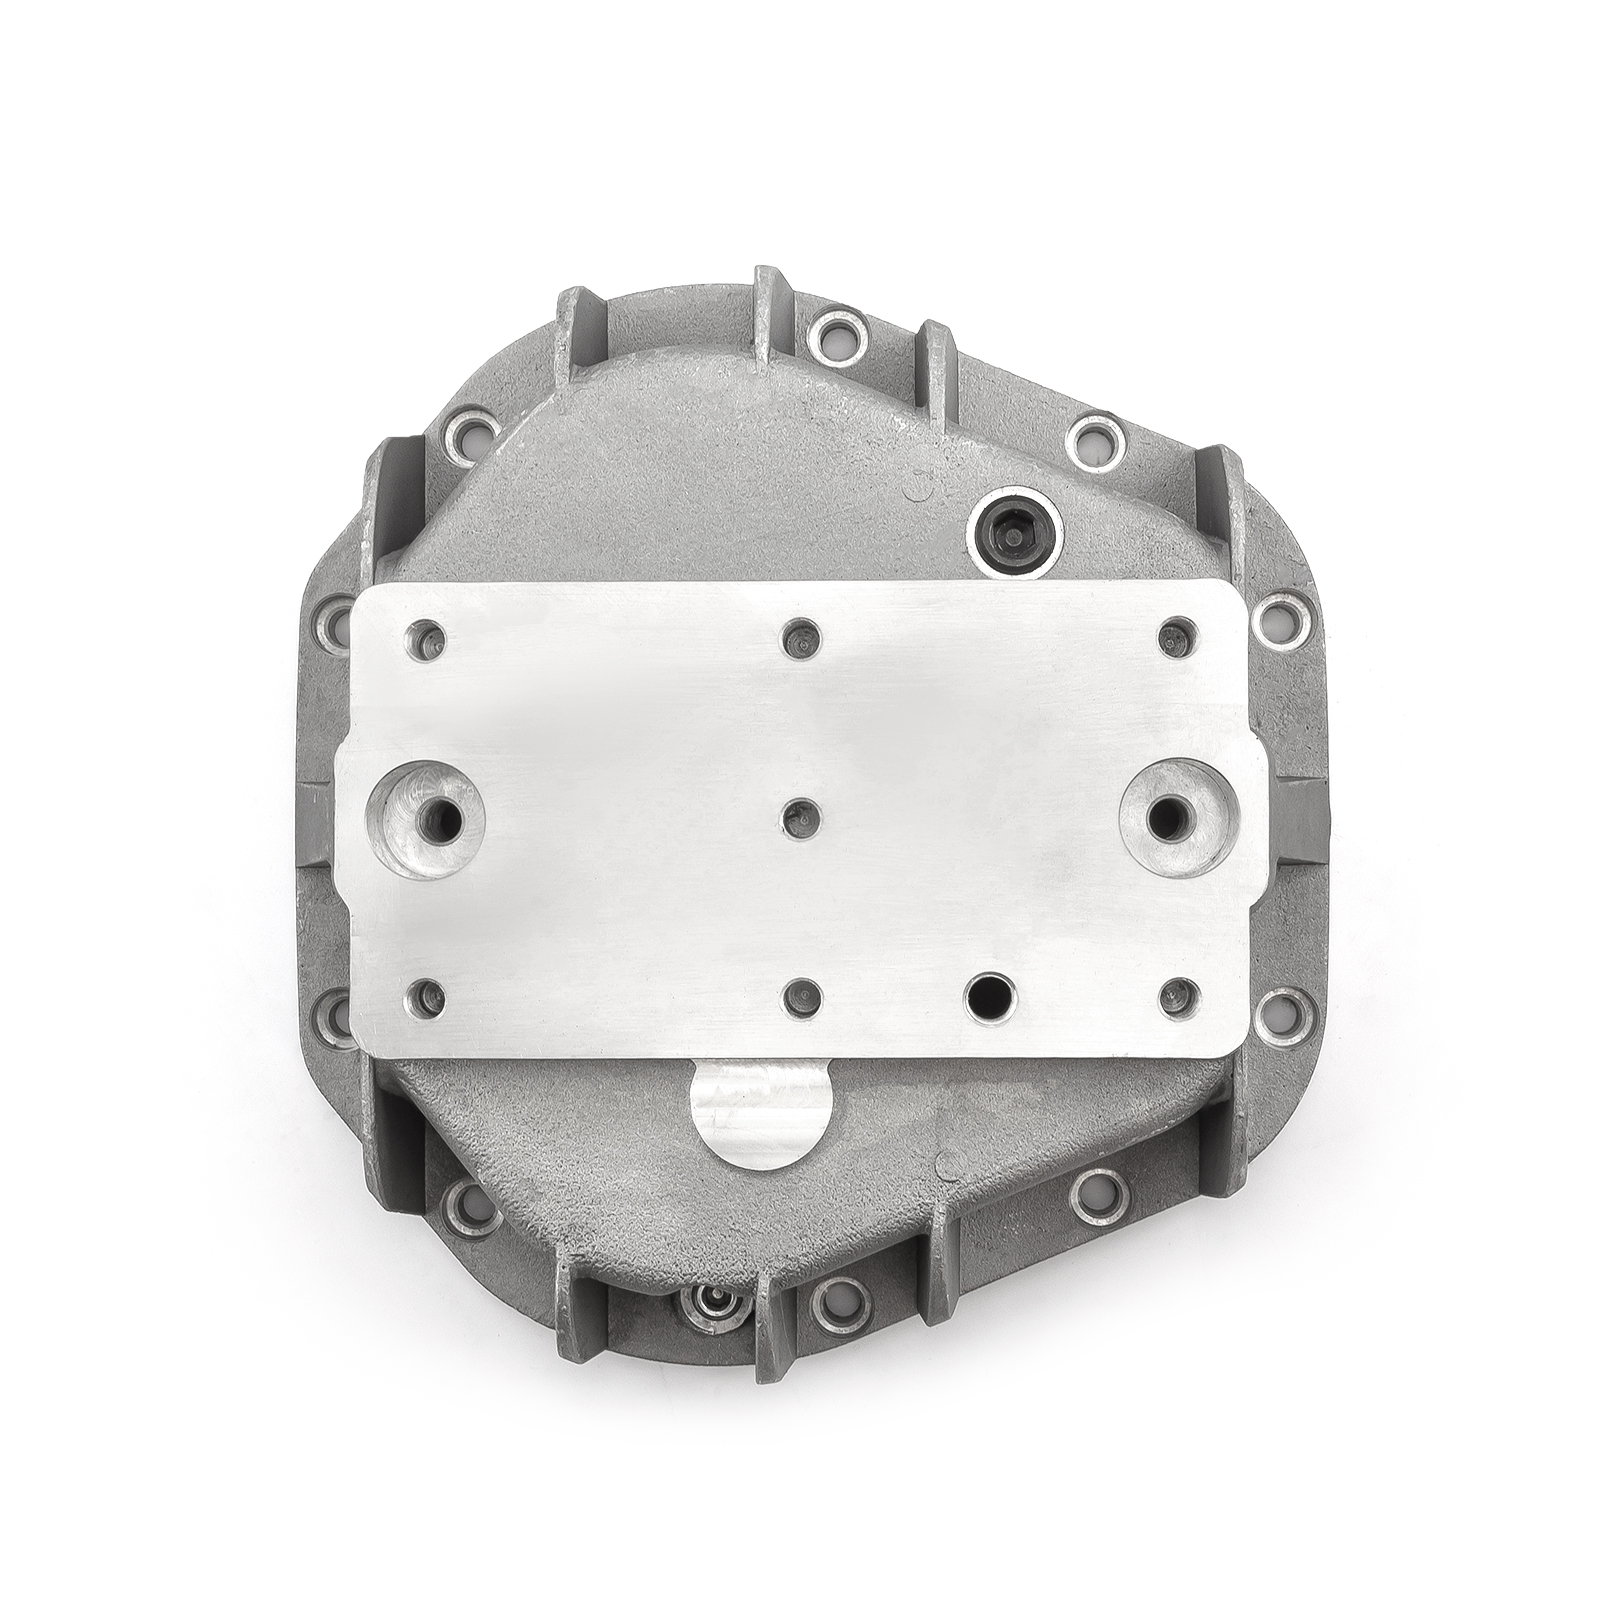 PCE® PCE515.1012 Dana 50 60 70 10-Bolt Aluminum Differential Rear Cover